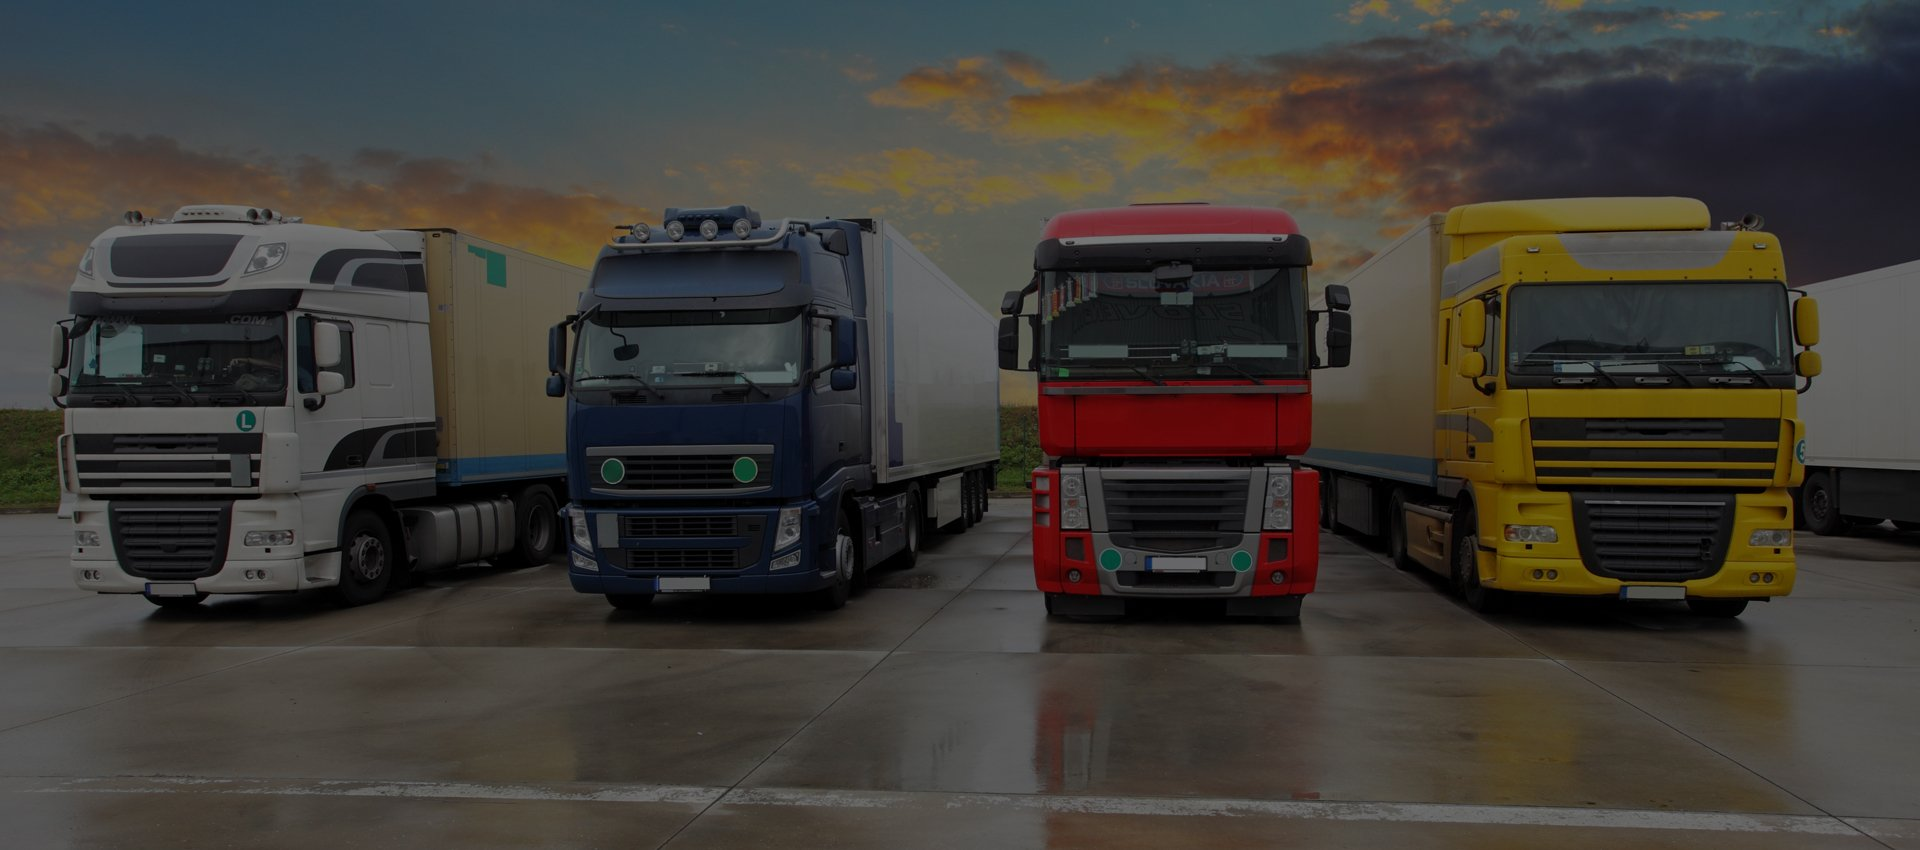 A row of haulage trucks